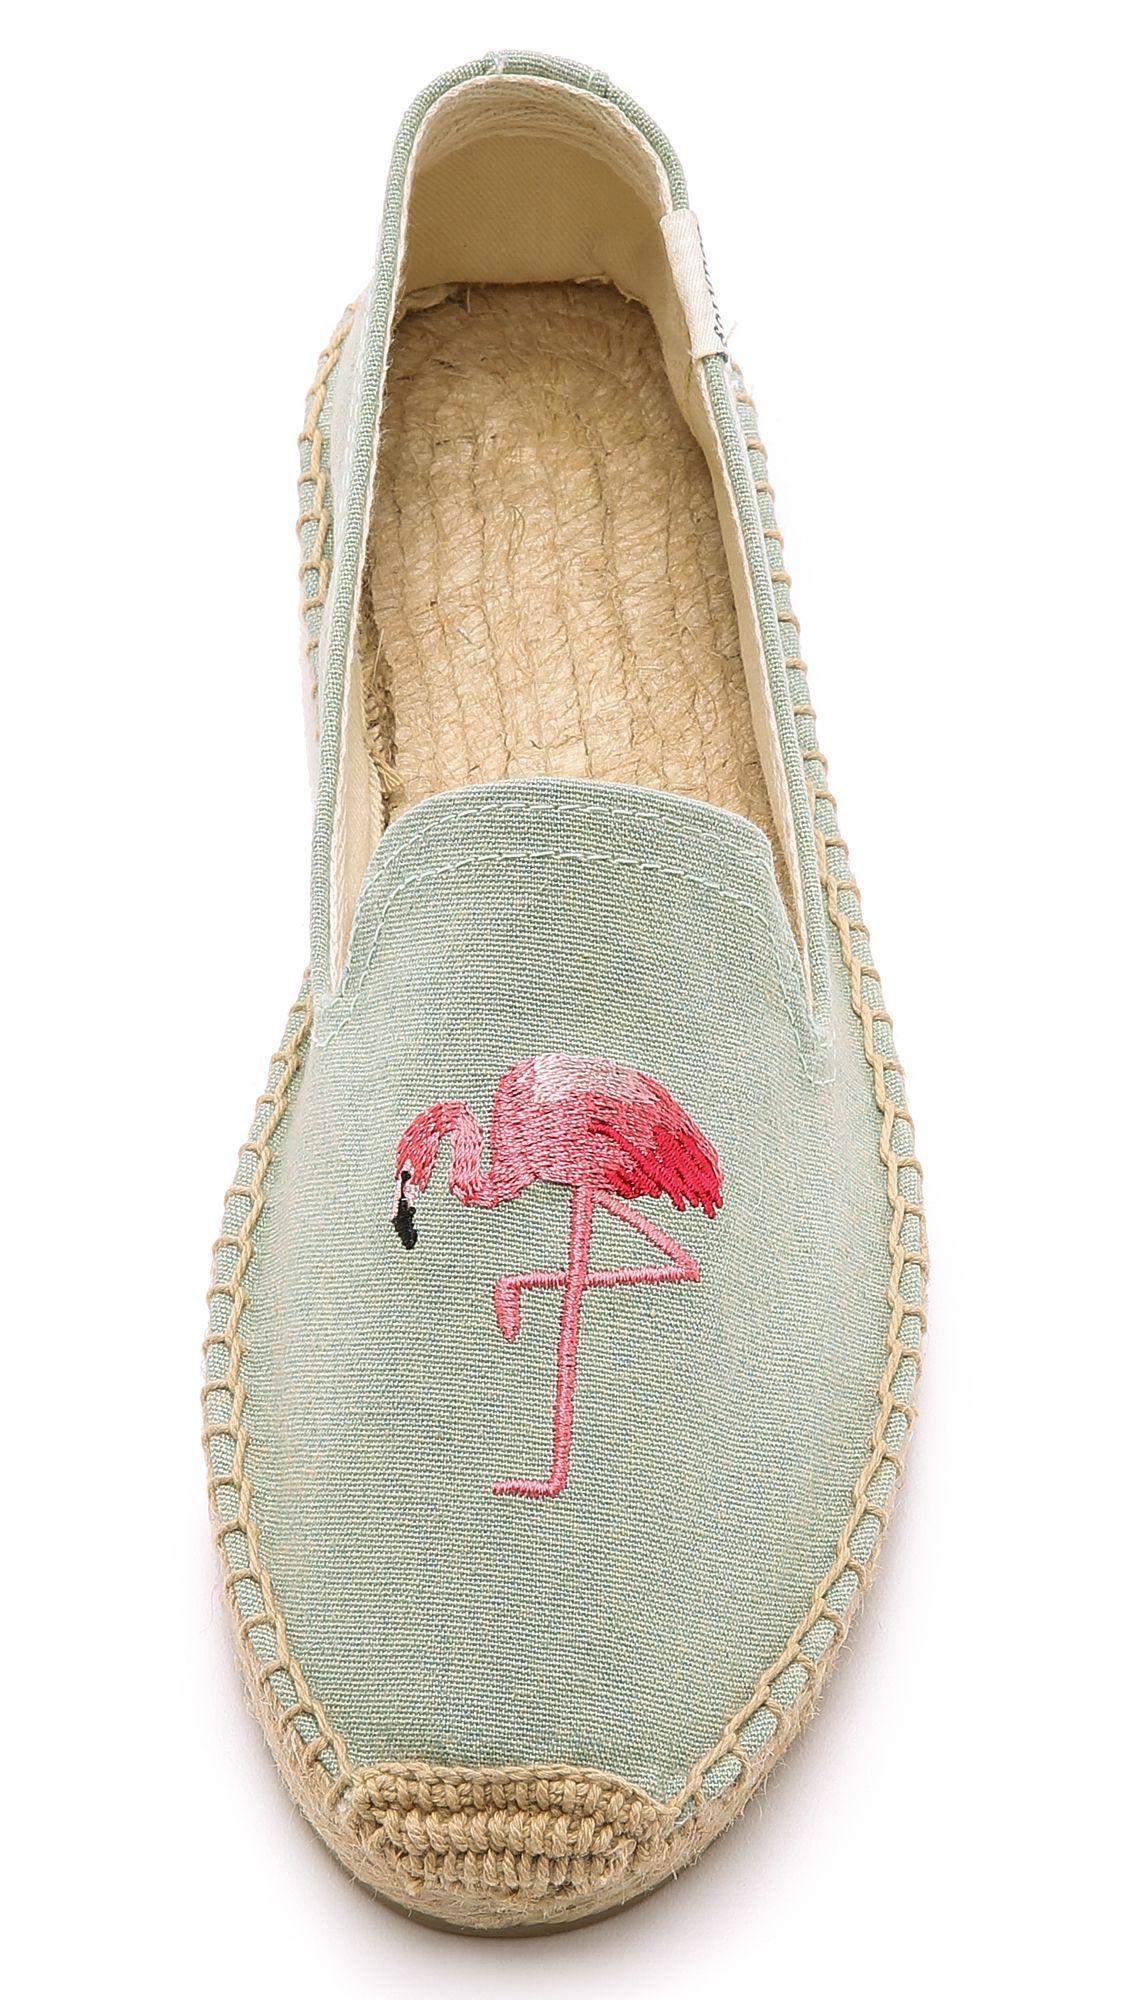 830b767f892 Flamingo Smoking Slipper Espadrilles | '' Shoes '' | Espadrilles ...